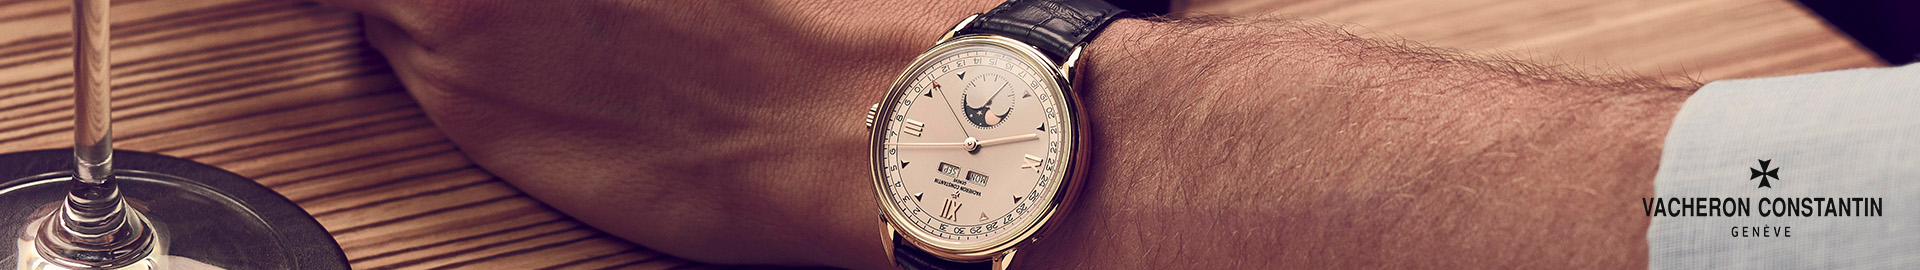 Vacheron Constantin herenhorloges Zazare Diamonds